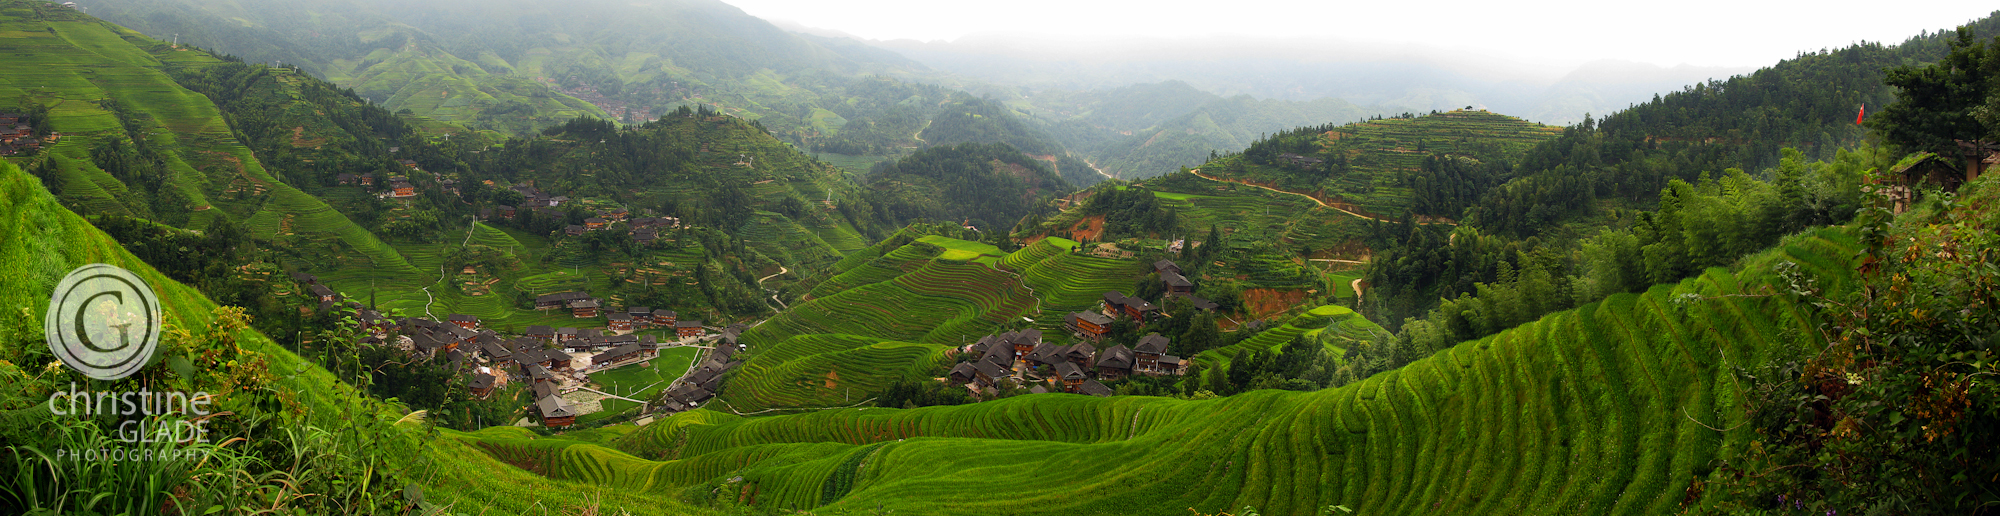 Hiking through China's Rice Terraces